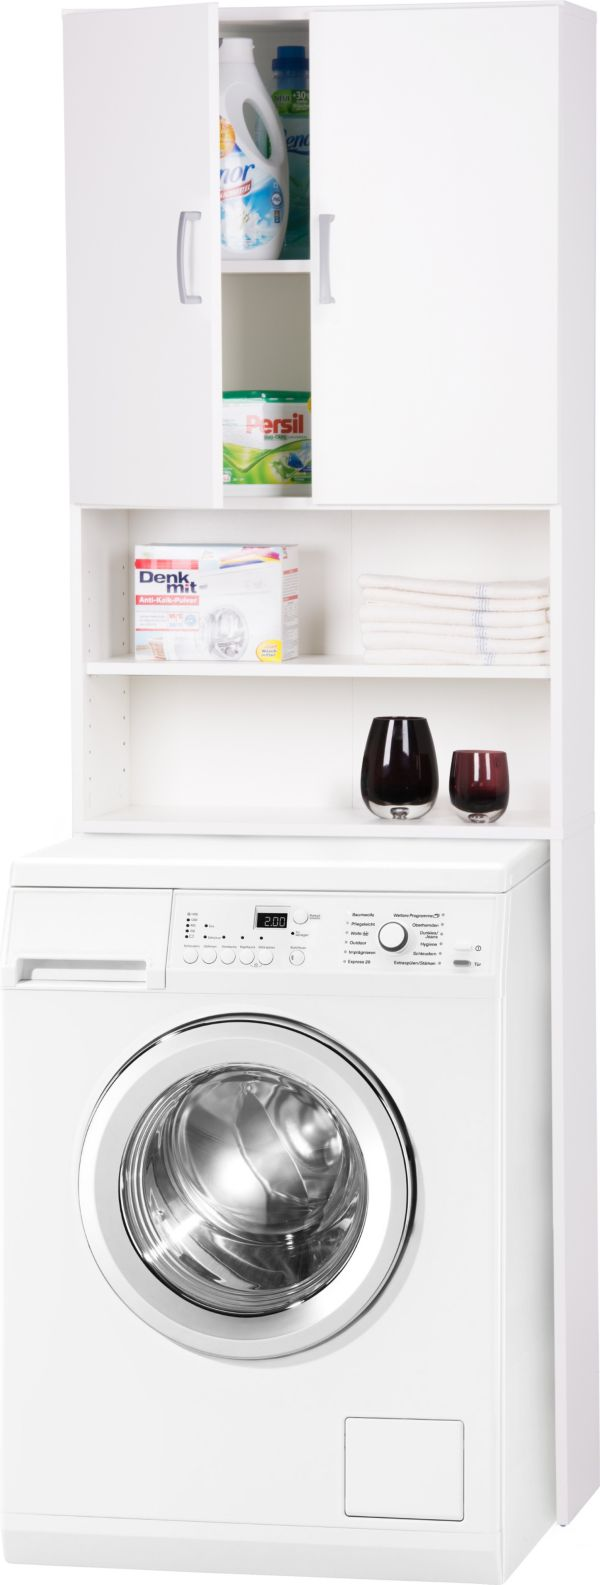 waschmaschinenumbauschrank olbia ii waschmaschinen. Black Bedroom Furniture Sets. Home Design Ideas